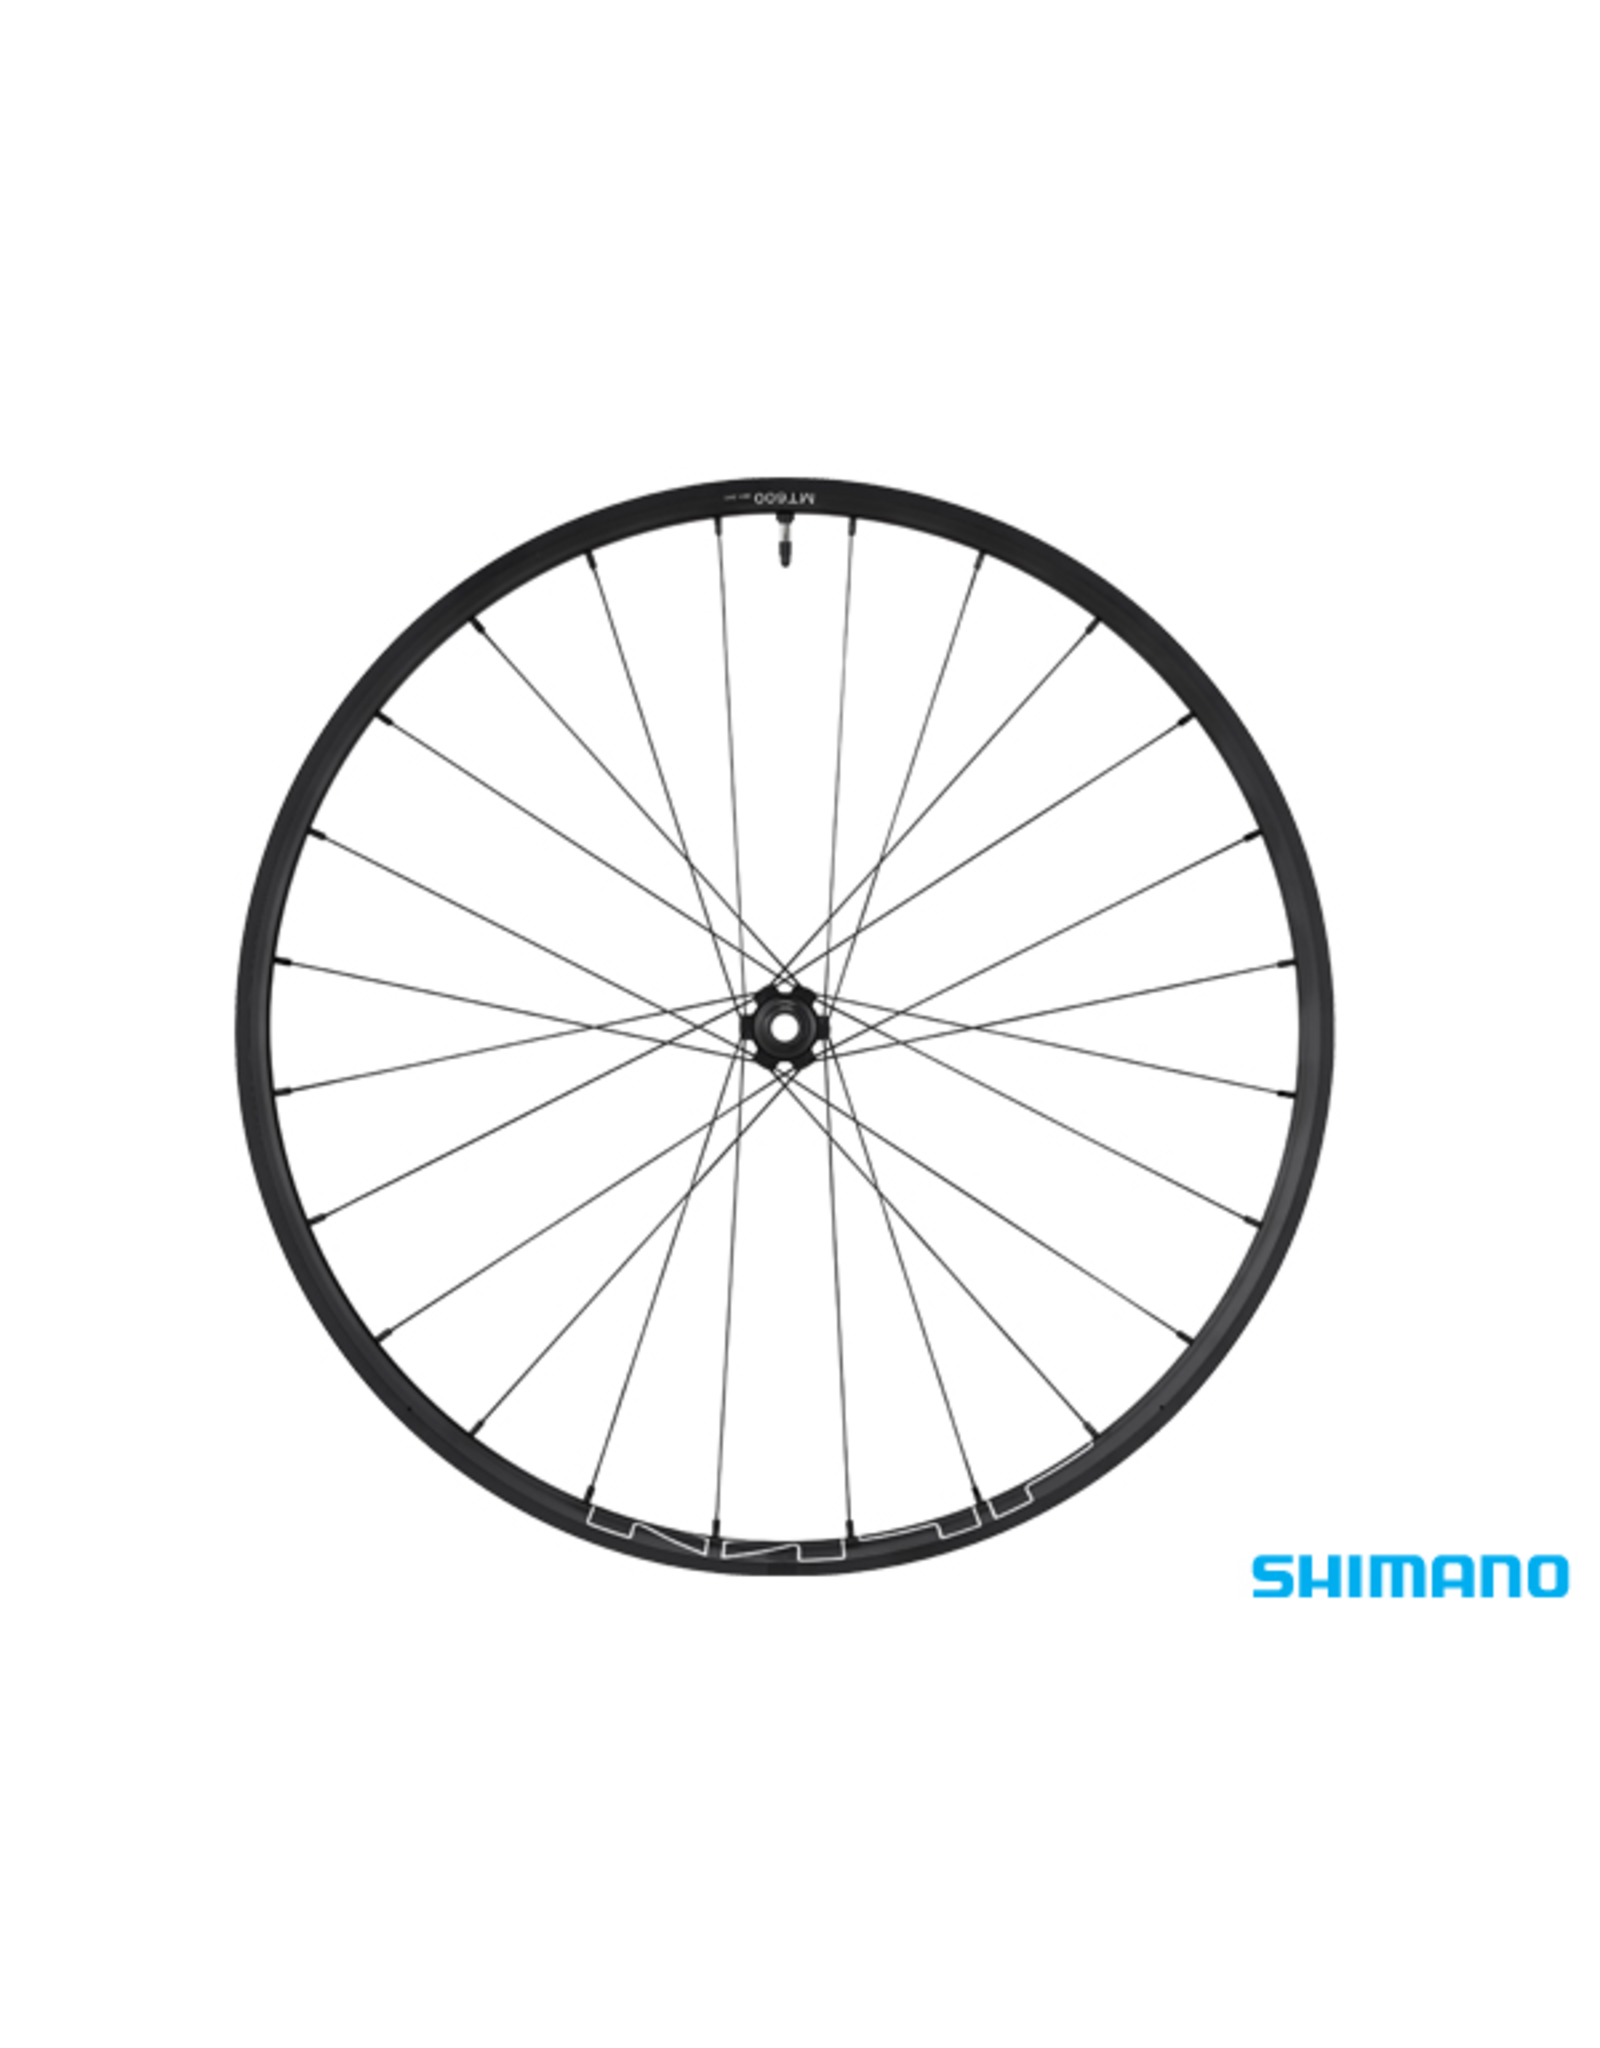 "Shimano WHEEL 27.5"" FRONT SHIMANO WH-MT600 BLACK 100x15mm CENTERLOCK TUBELESS"